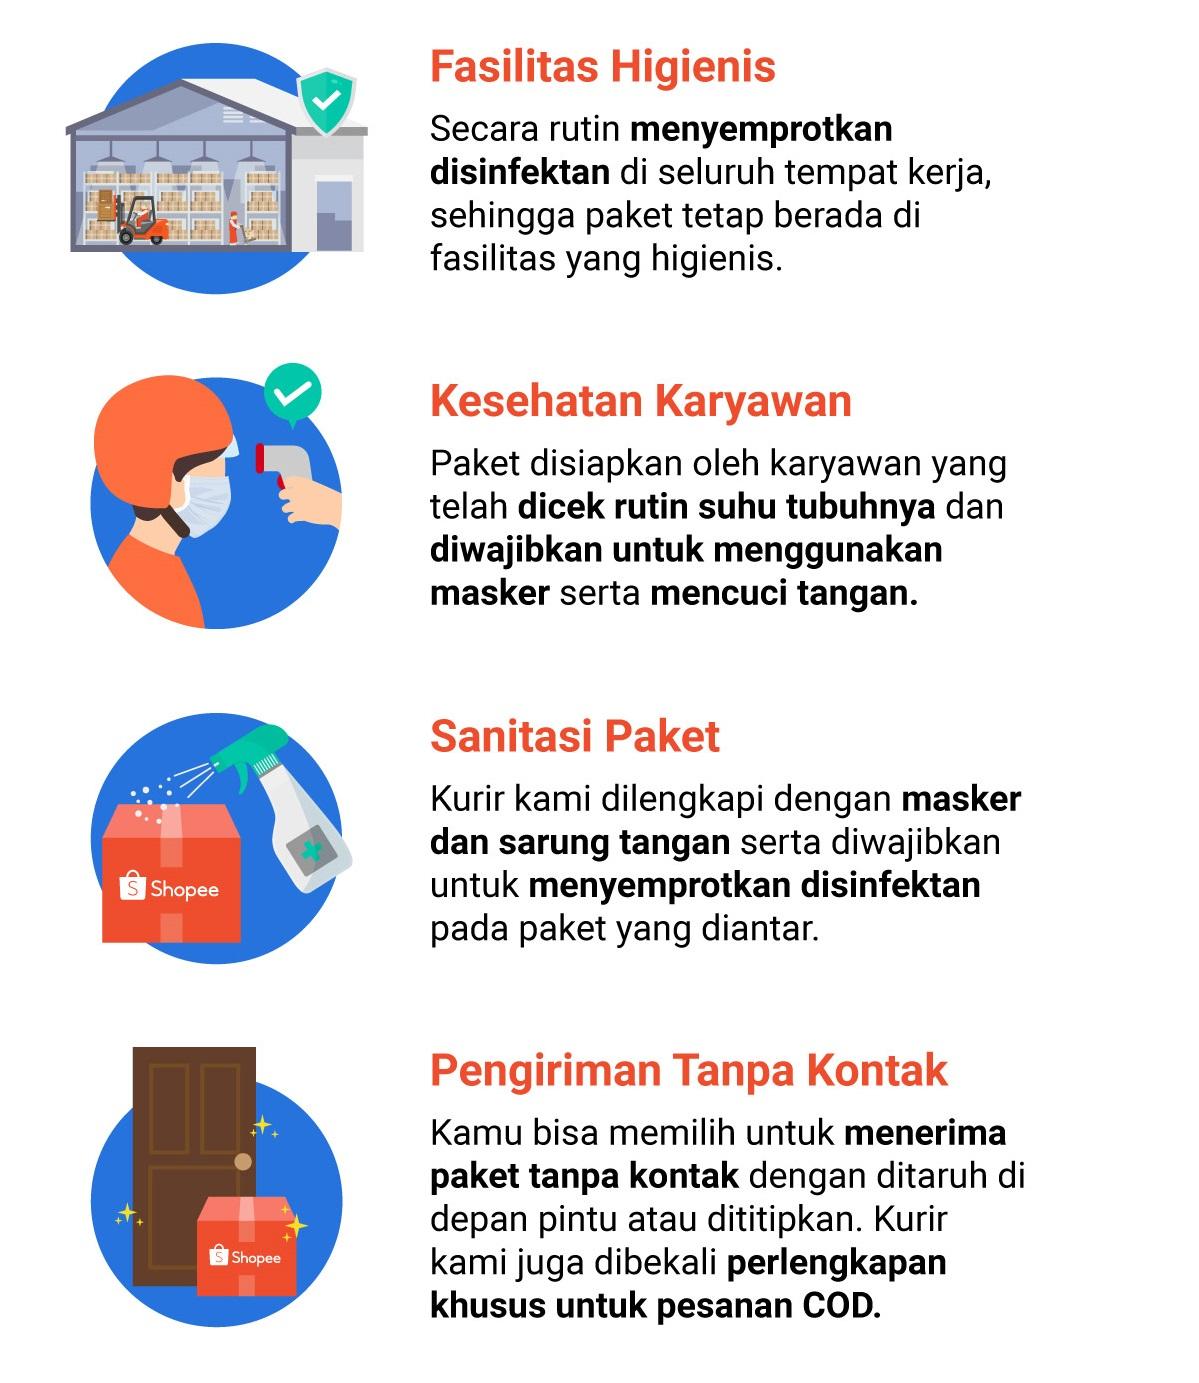 Shopee Express Pusat Edukasi Penjual Shopee Indonesia